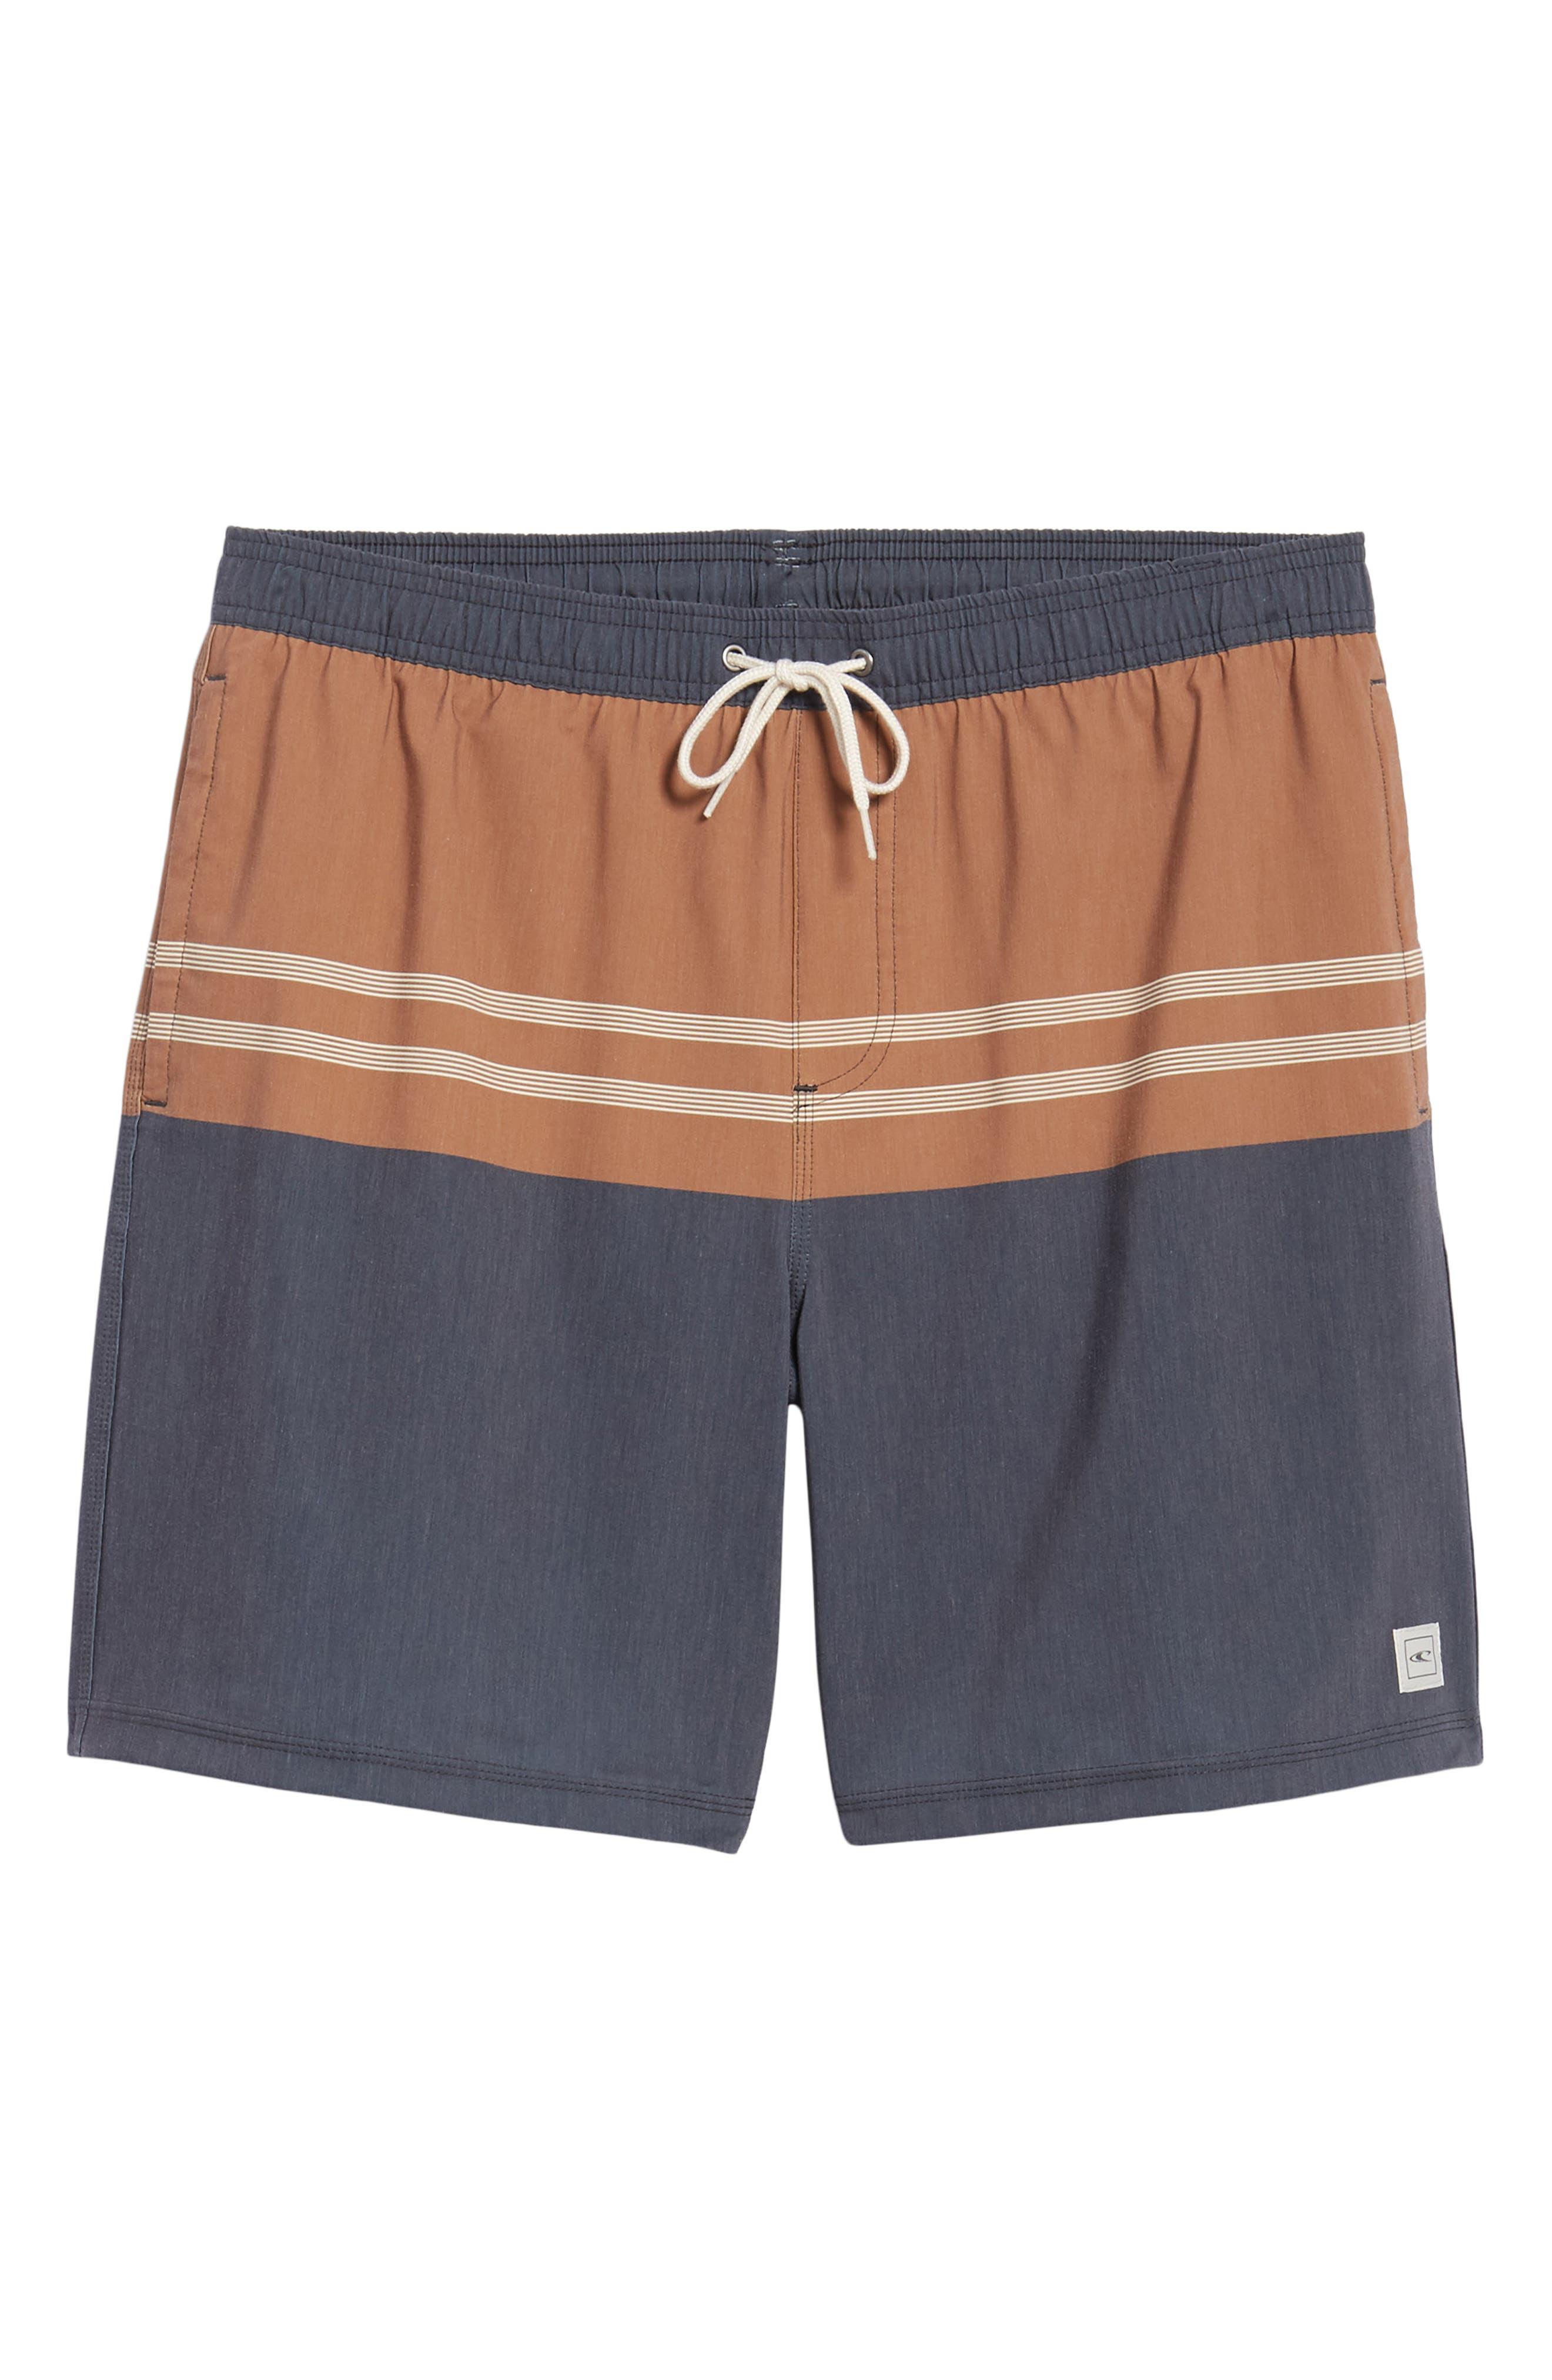 Pier Board Shorts,                             Alternate thumbnail 16, color,